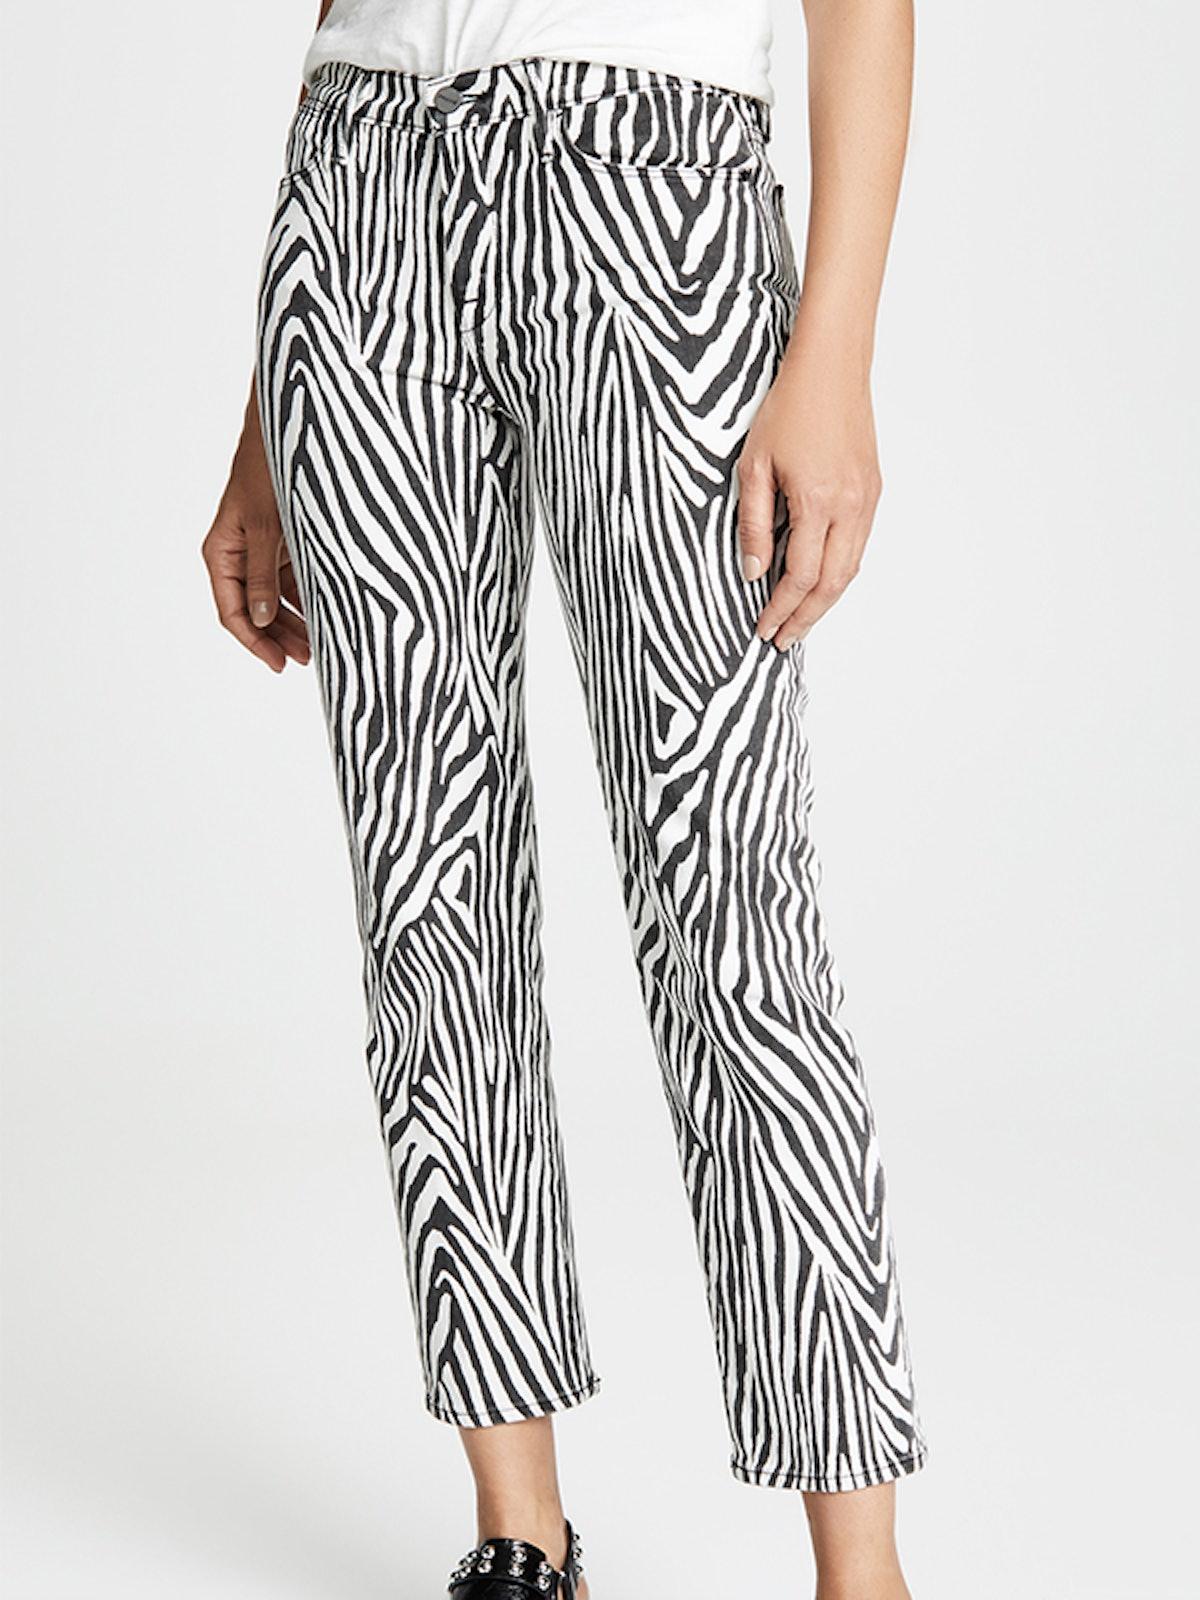 Le High Straight Zebra Jeans